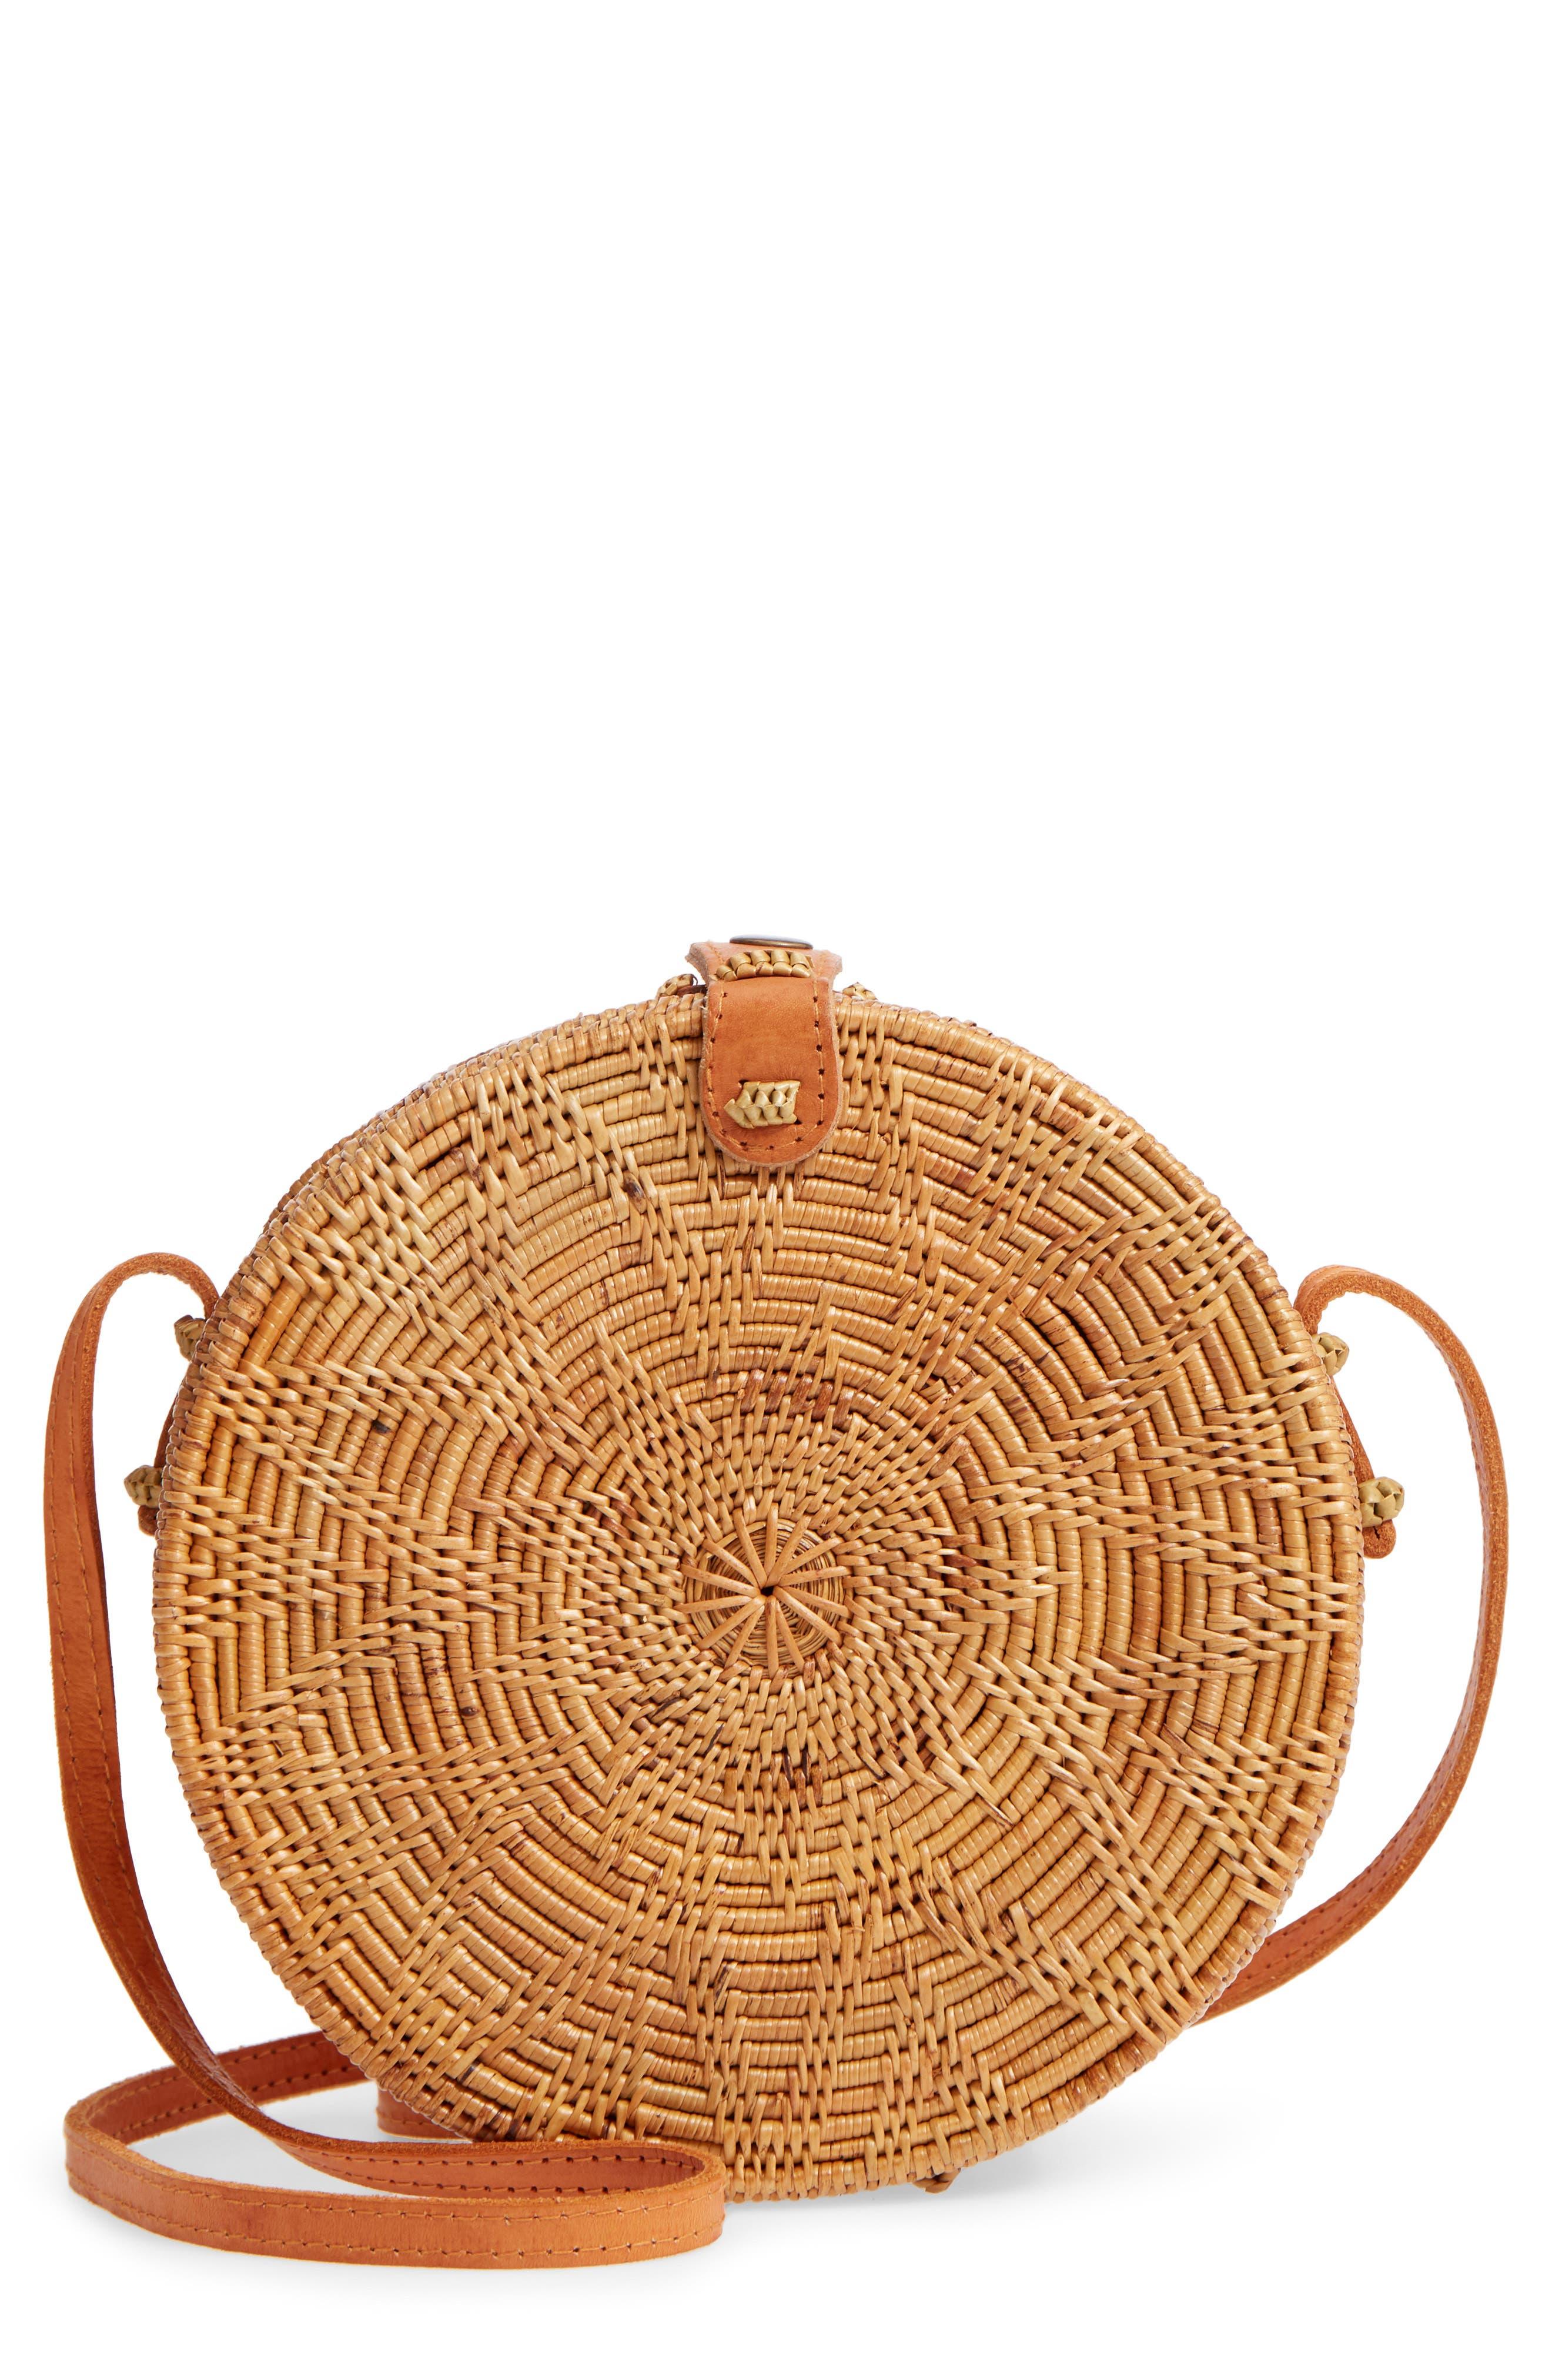 Woven Rattan Circle Basket Crossbody,                         Main,                         color, Tan